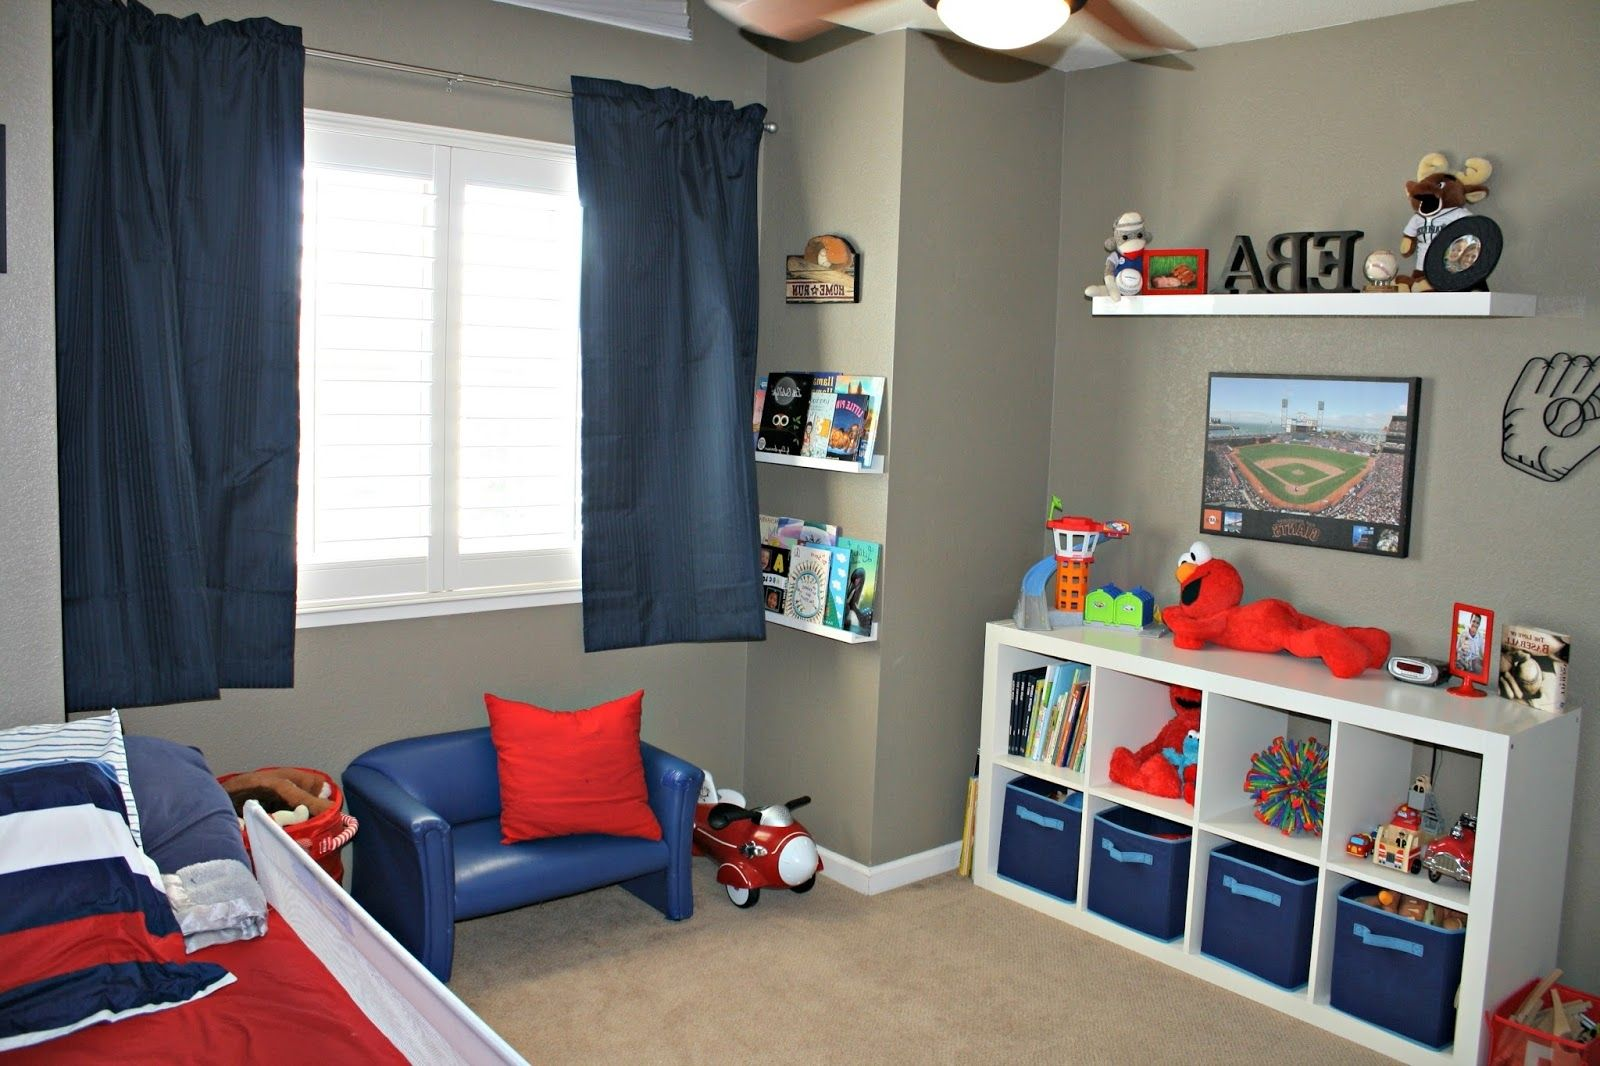 Boy Bedroom Ideas - Visi Build 3D | Home Decor | Pinterest ...